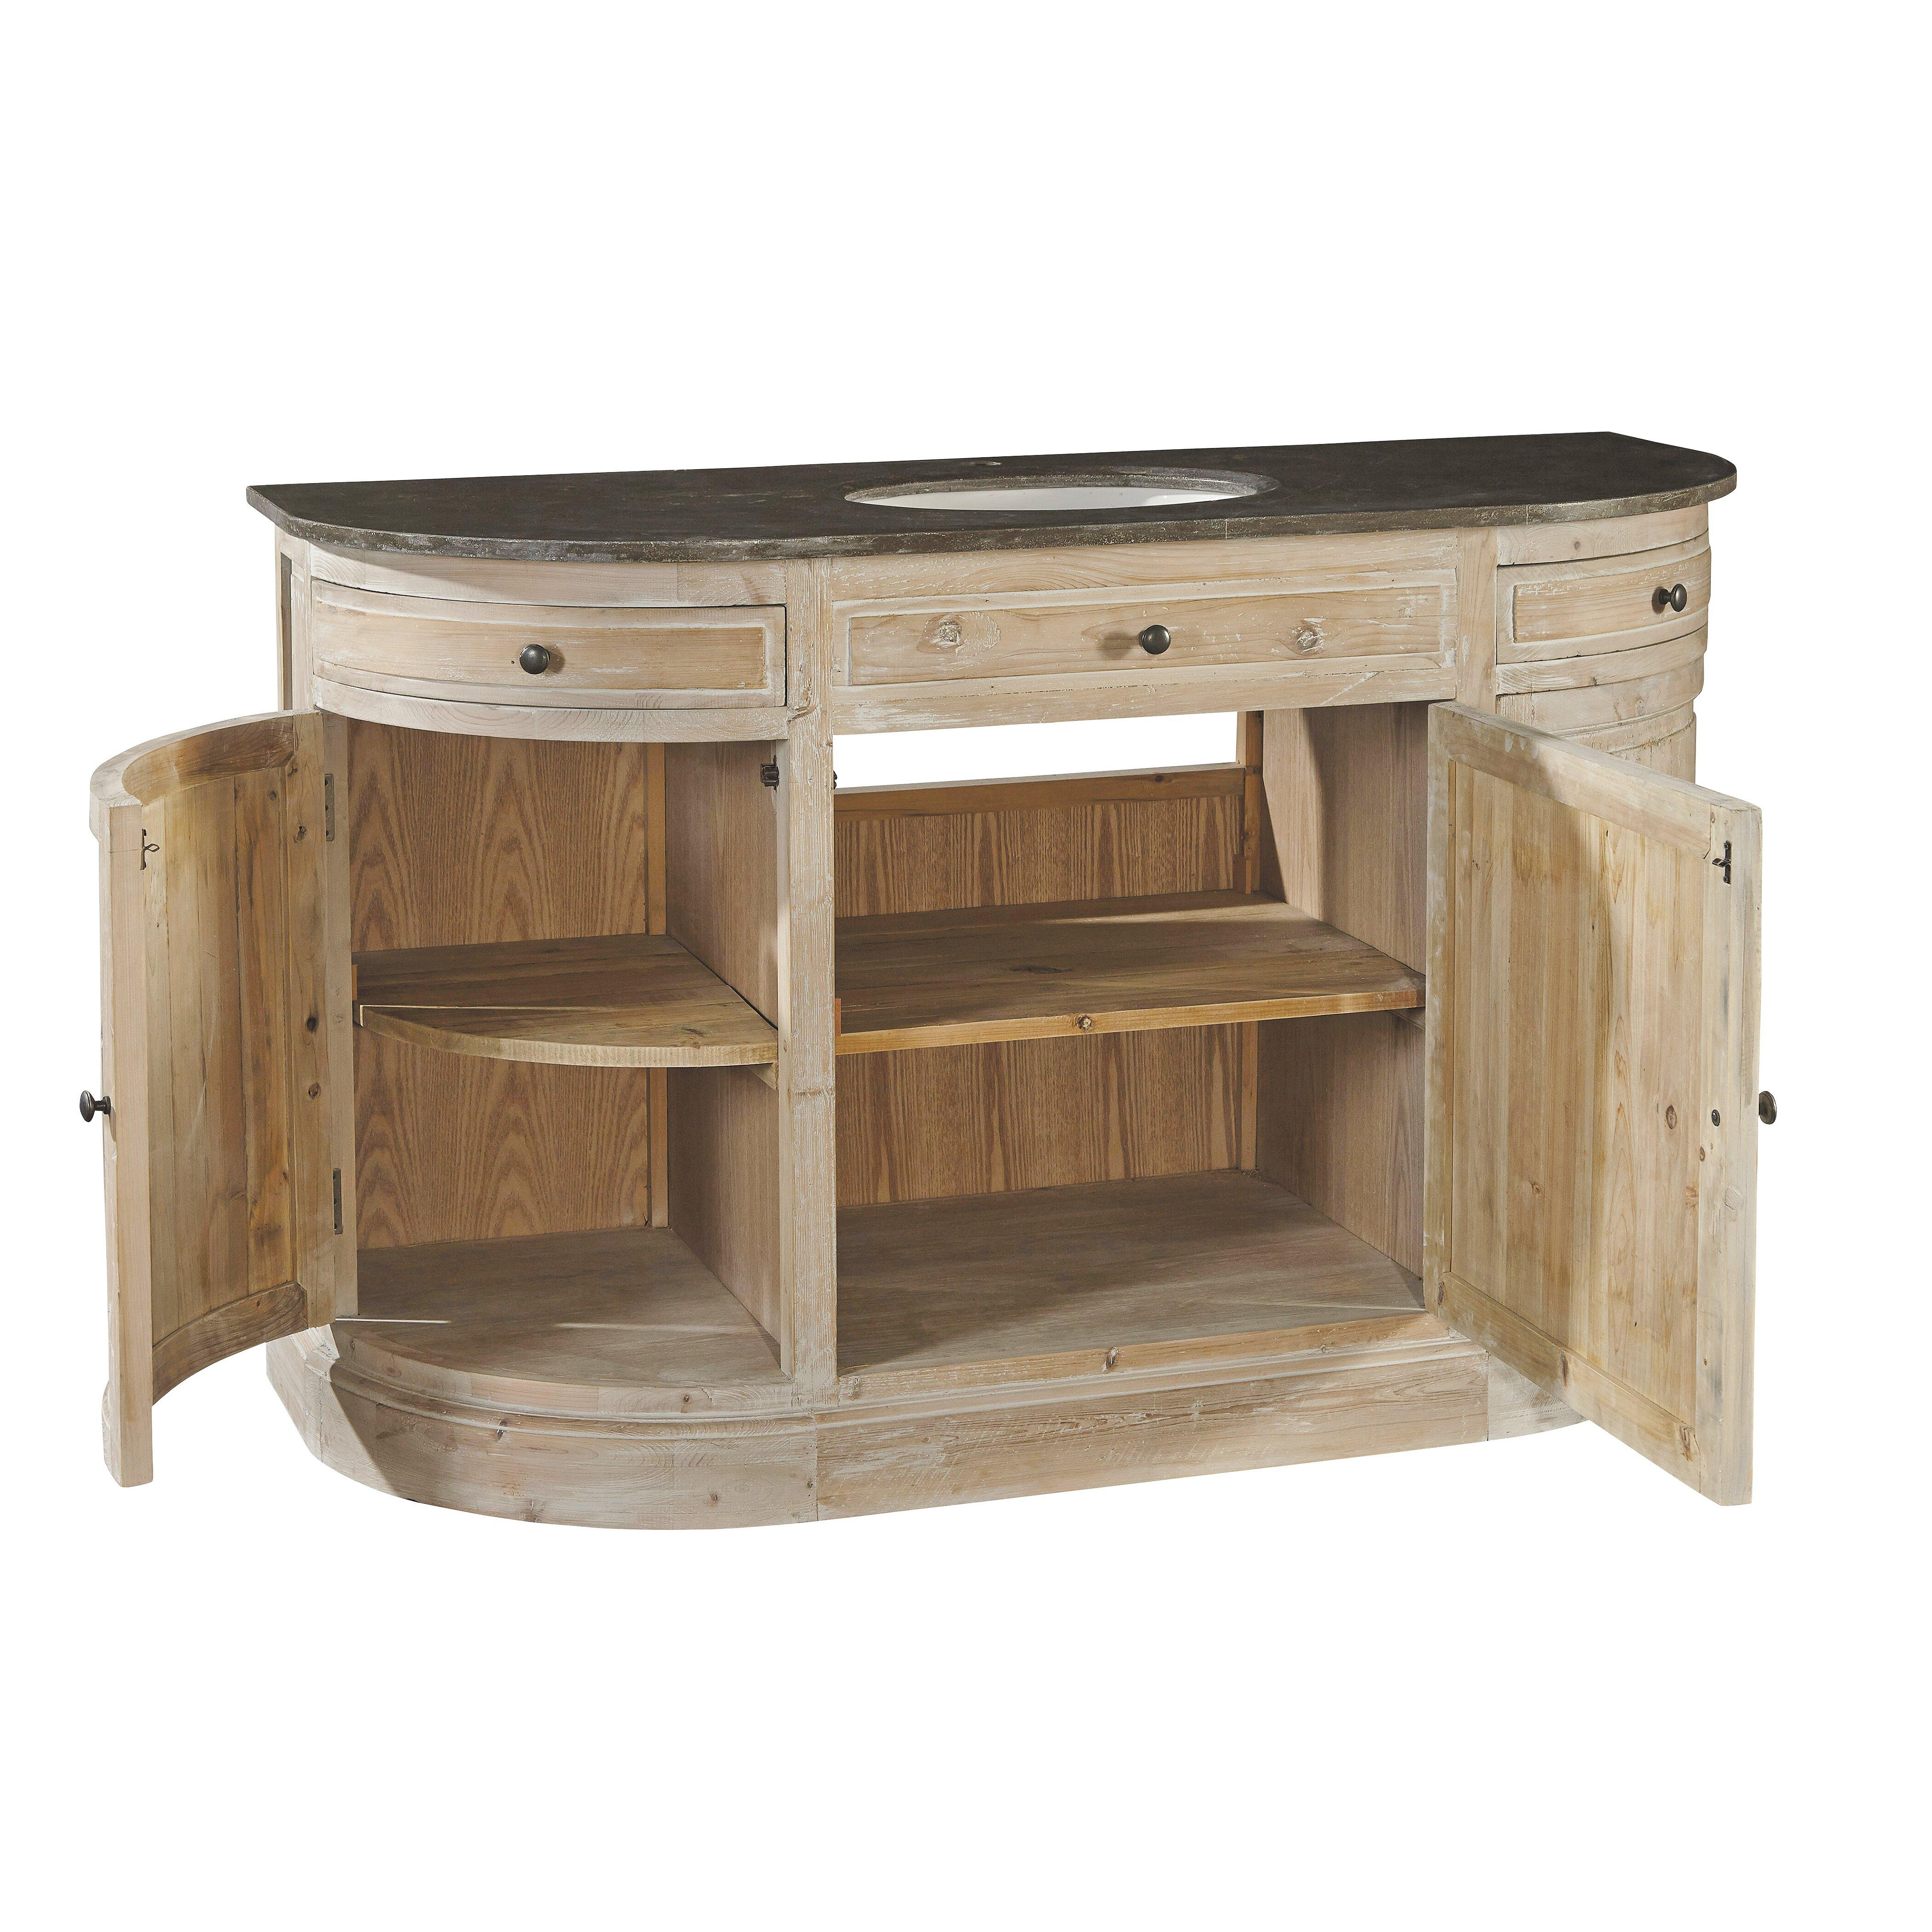 Furniture Classics LTD 57.5